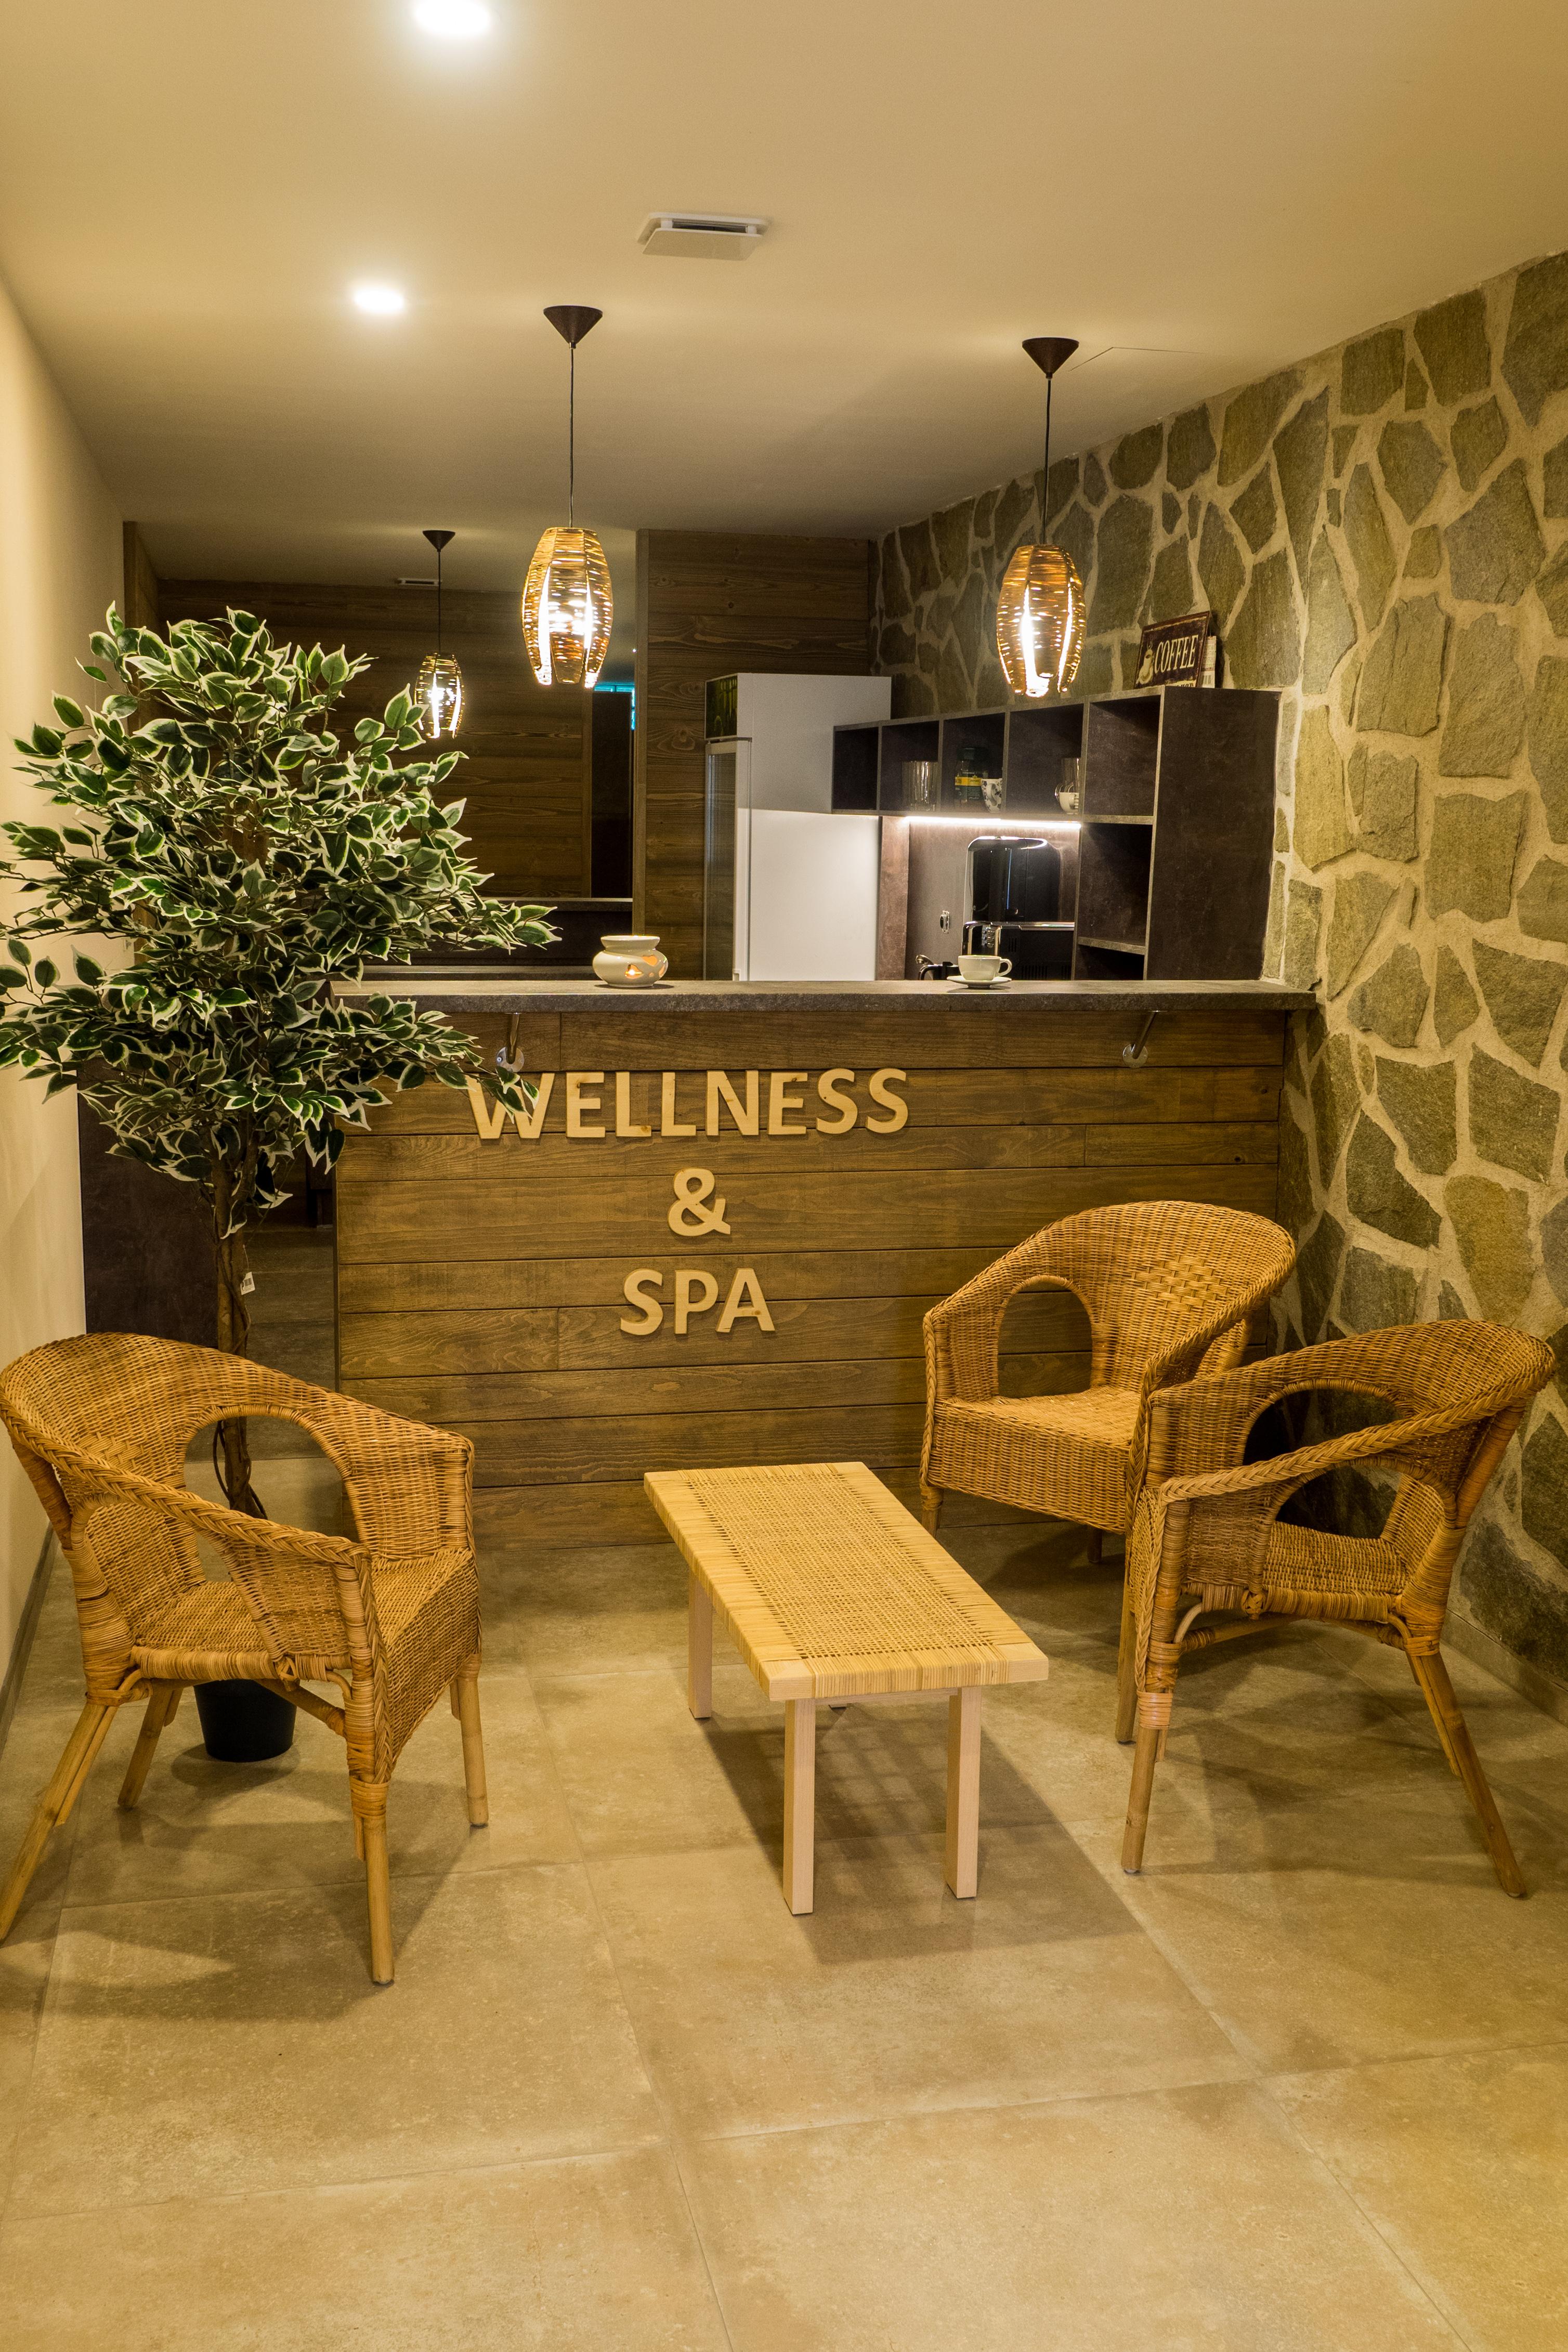 Wellness & Spa Matangi recepce